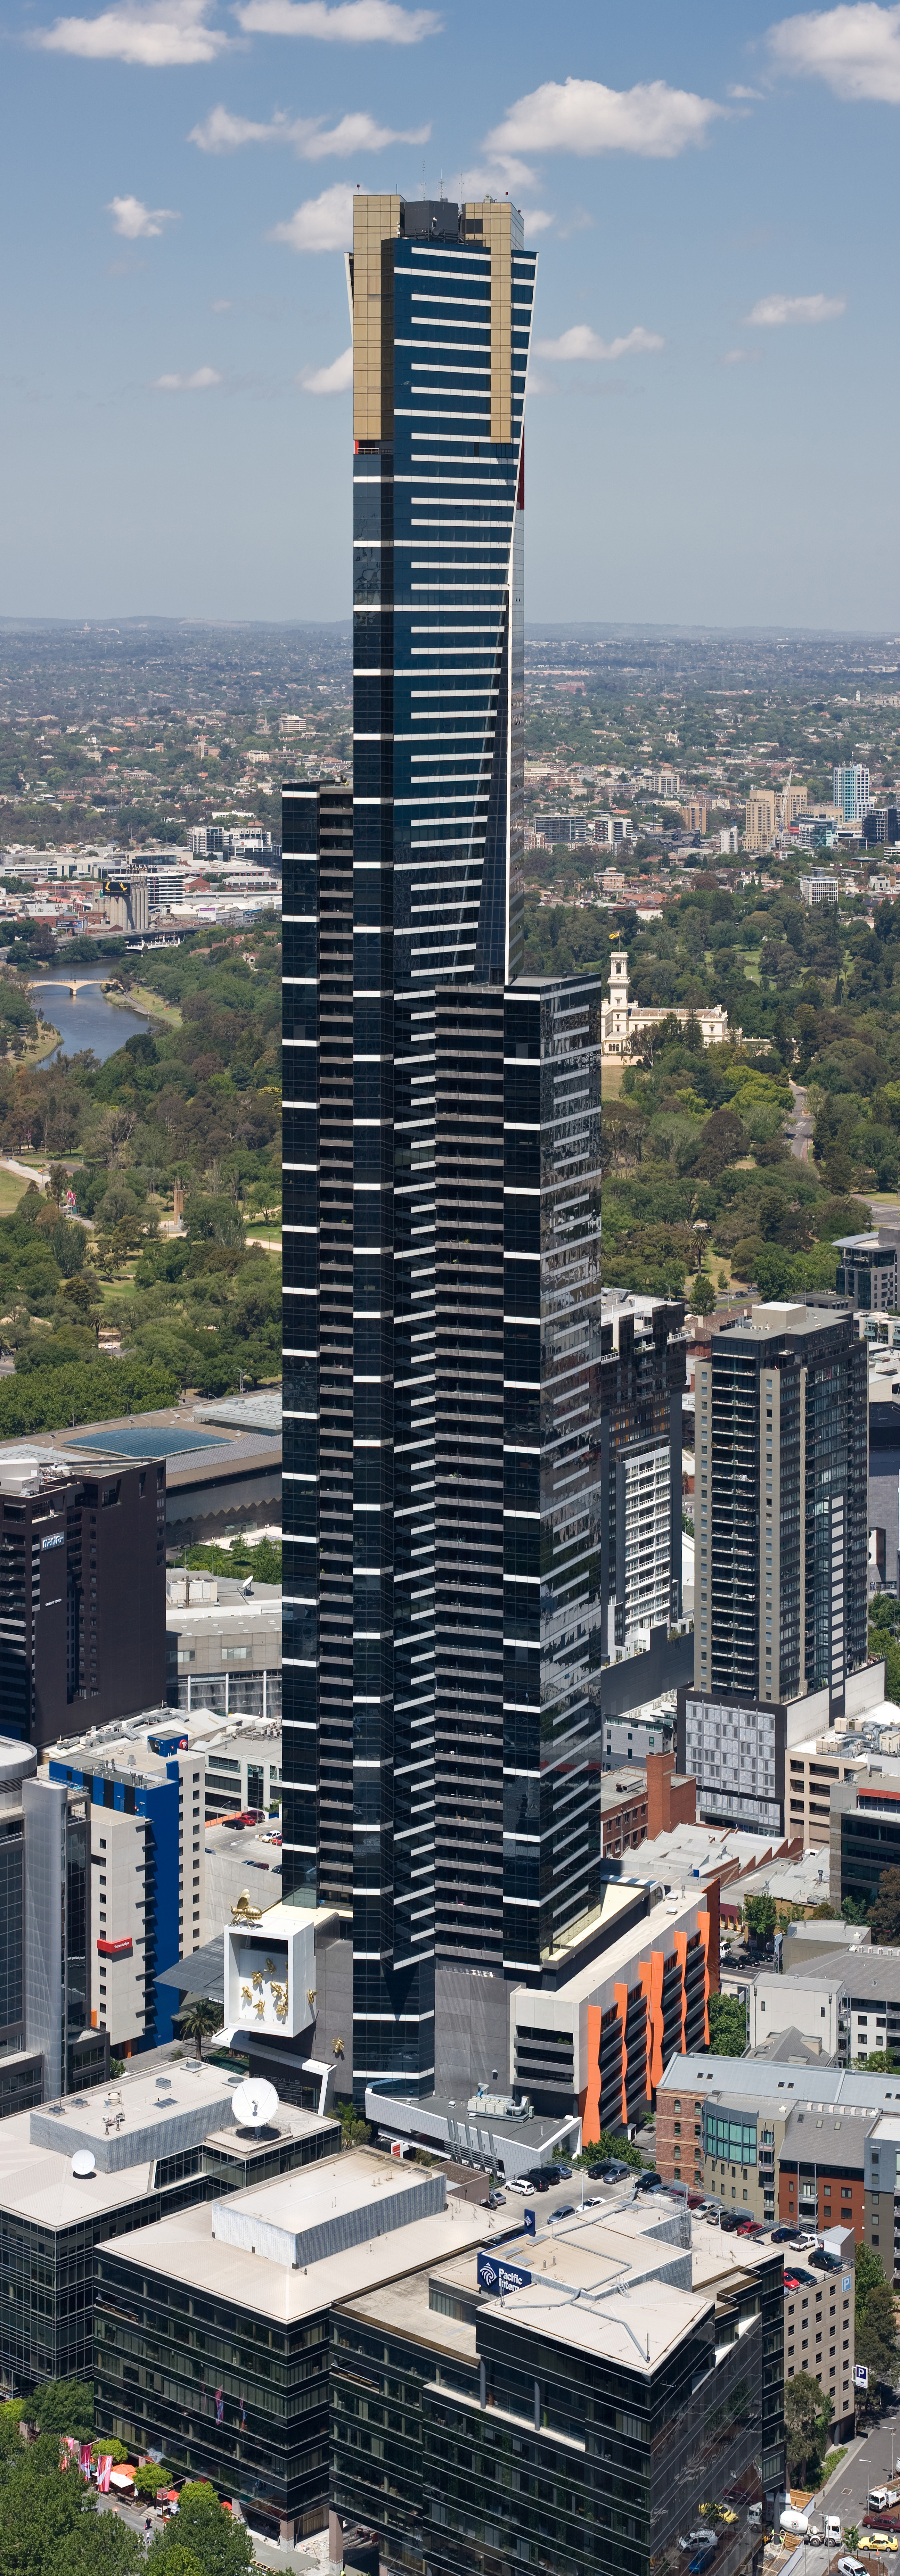 Datei:Eureka Tower, Melbourne - Nov 2008.jpg – Wikipedia